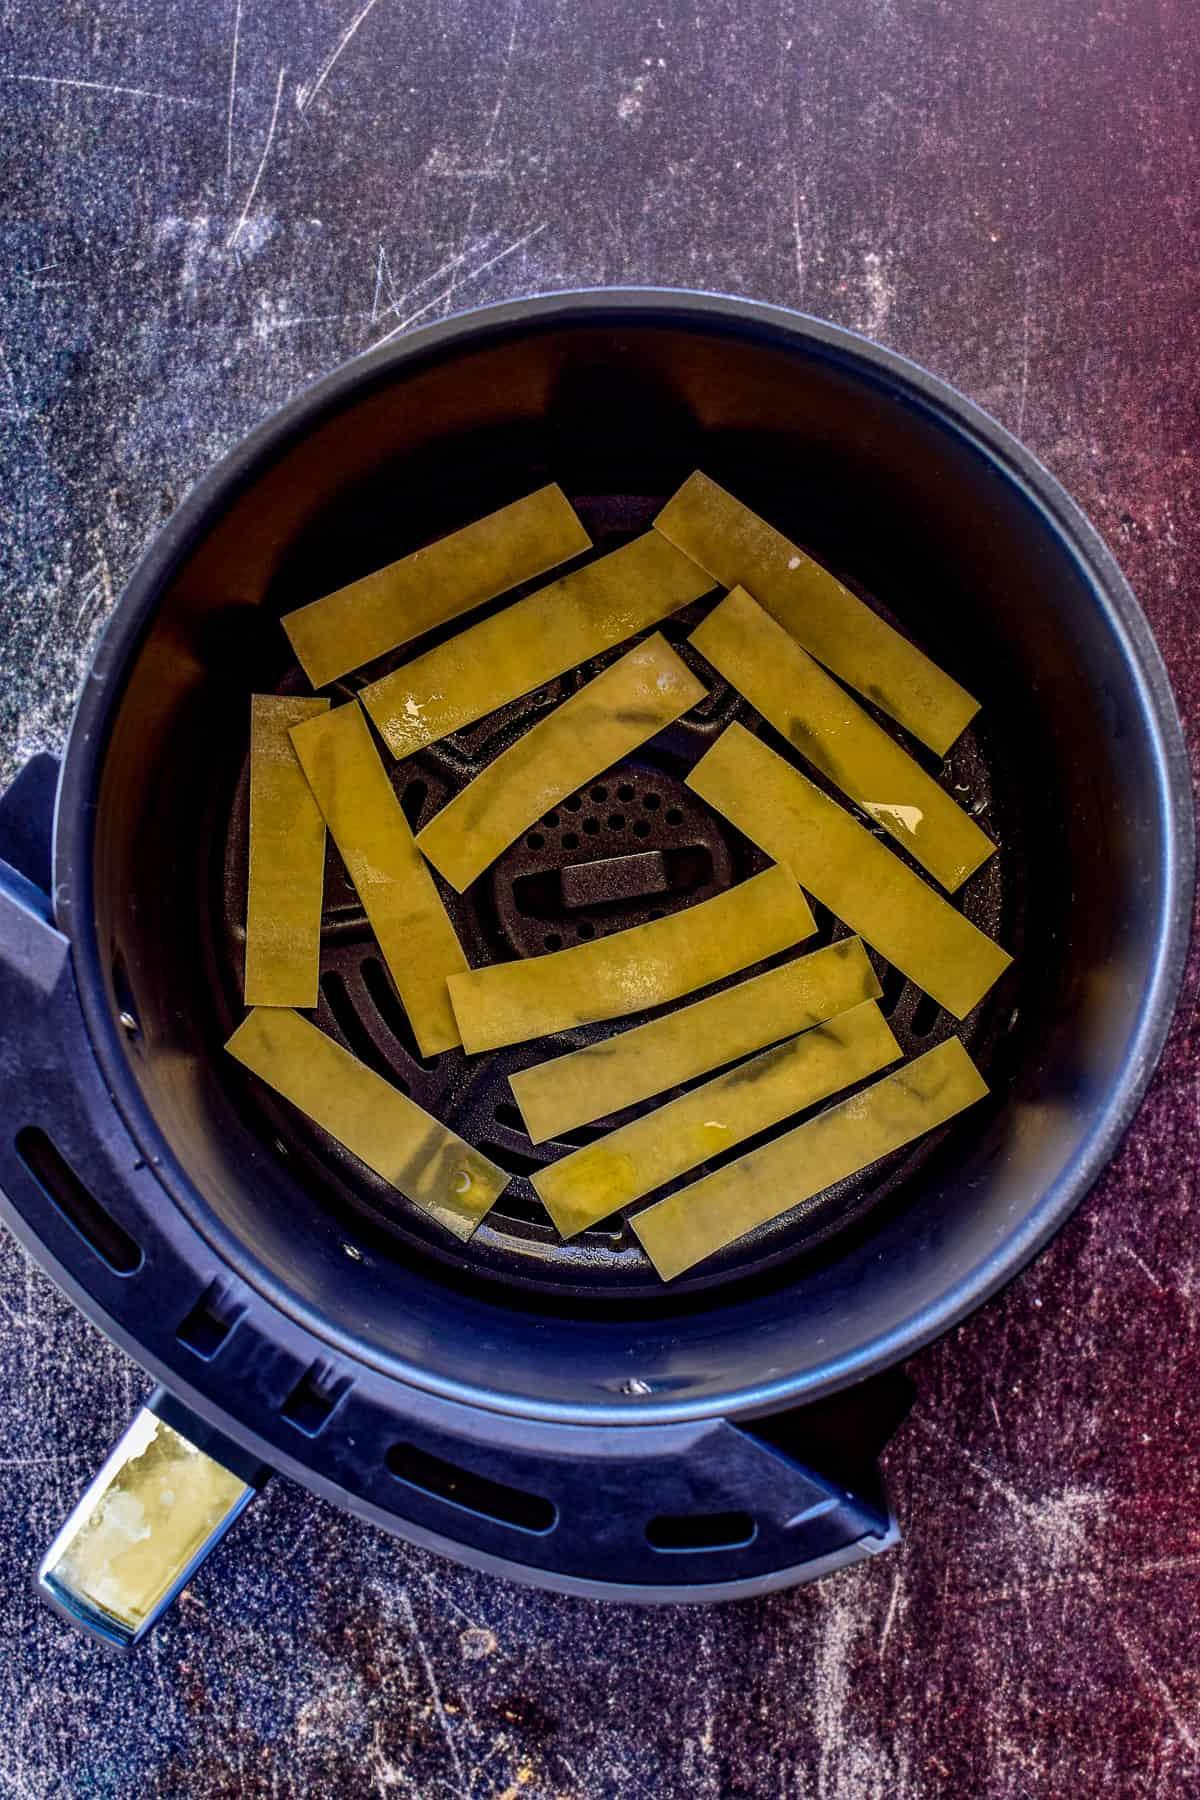 Wonton strips in an air fryer basket